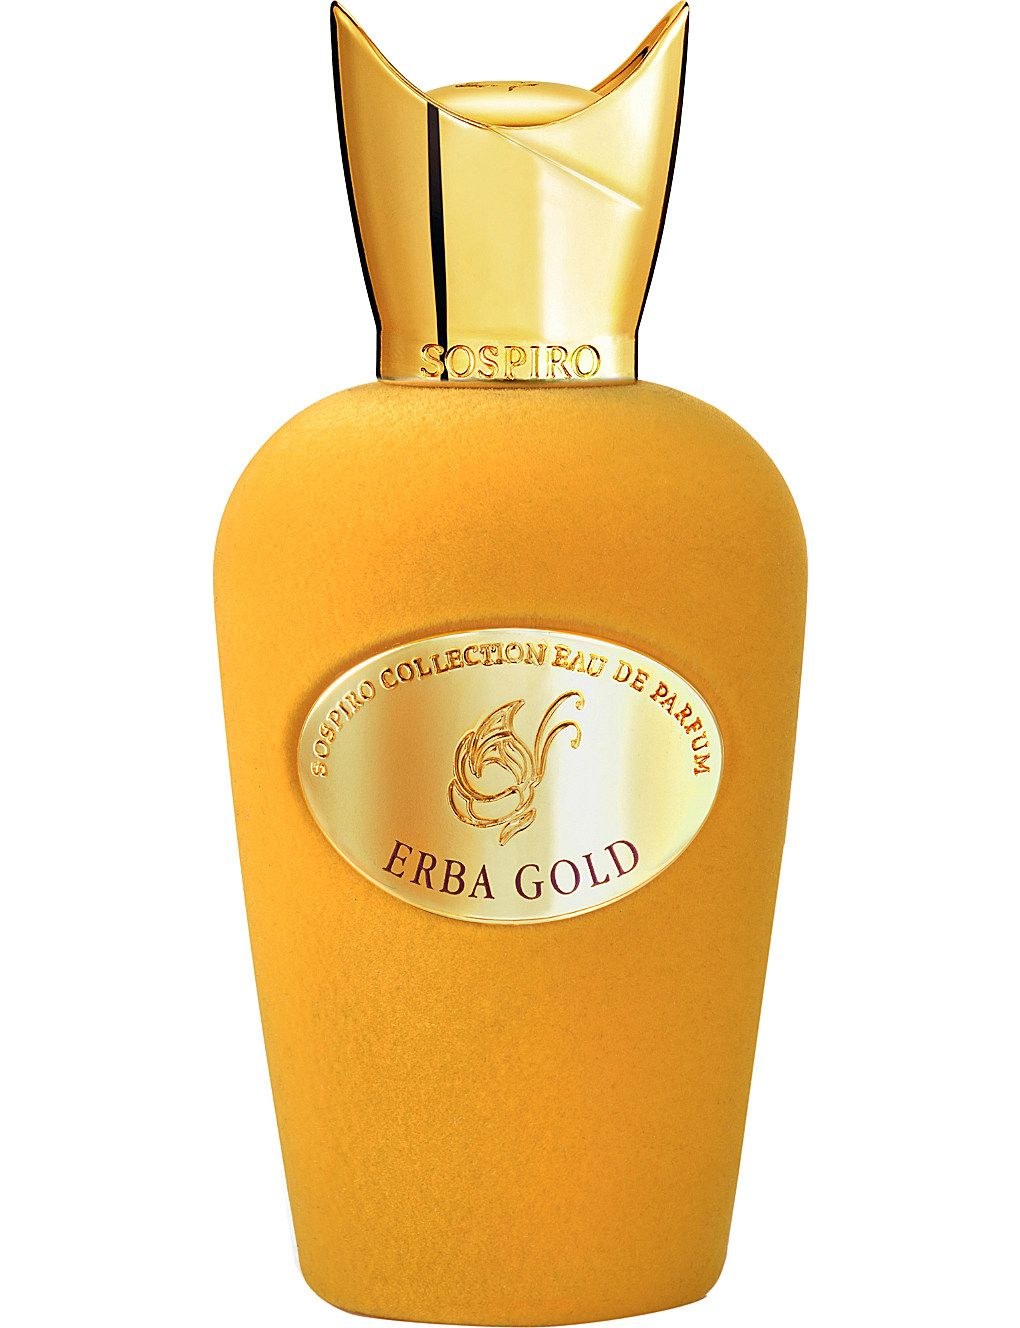 Sospiro Erba Gold Eau De Parfum 100ml Parfumes Perfume Bottles